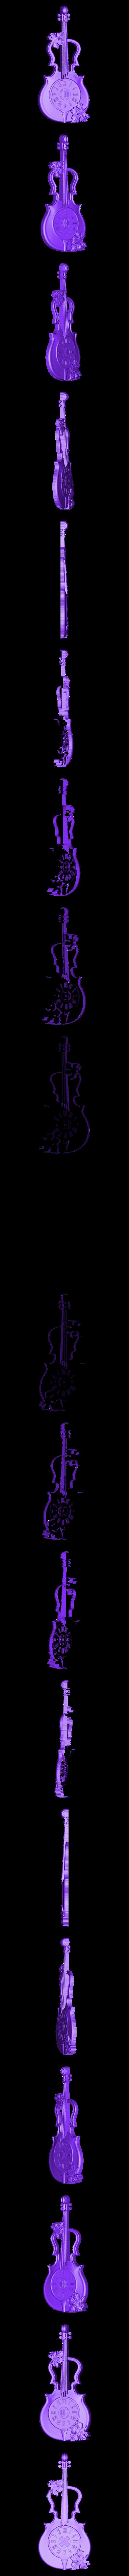 1028. Wall_Clock.STL Download free STL file Violin Wall Clock • 3D printer model, stl3dmodel